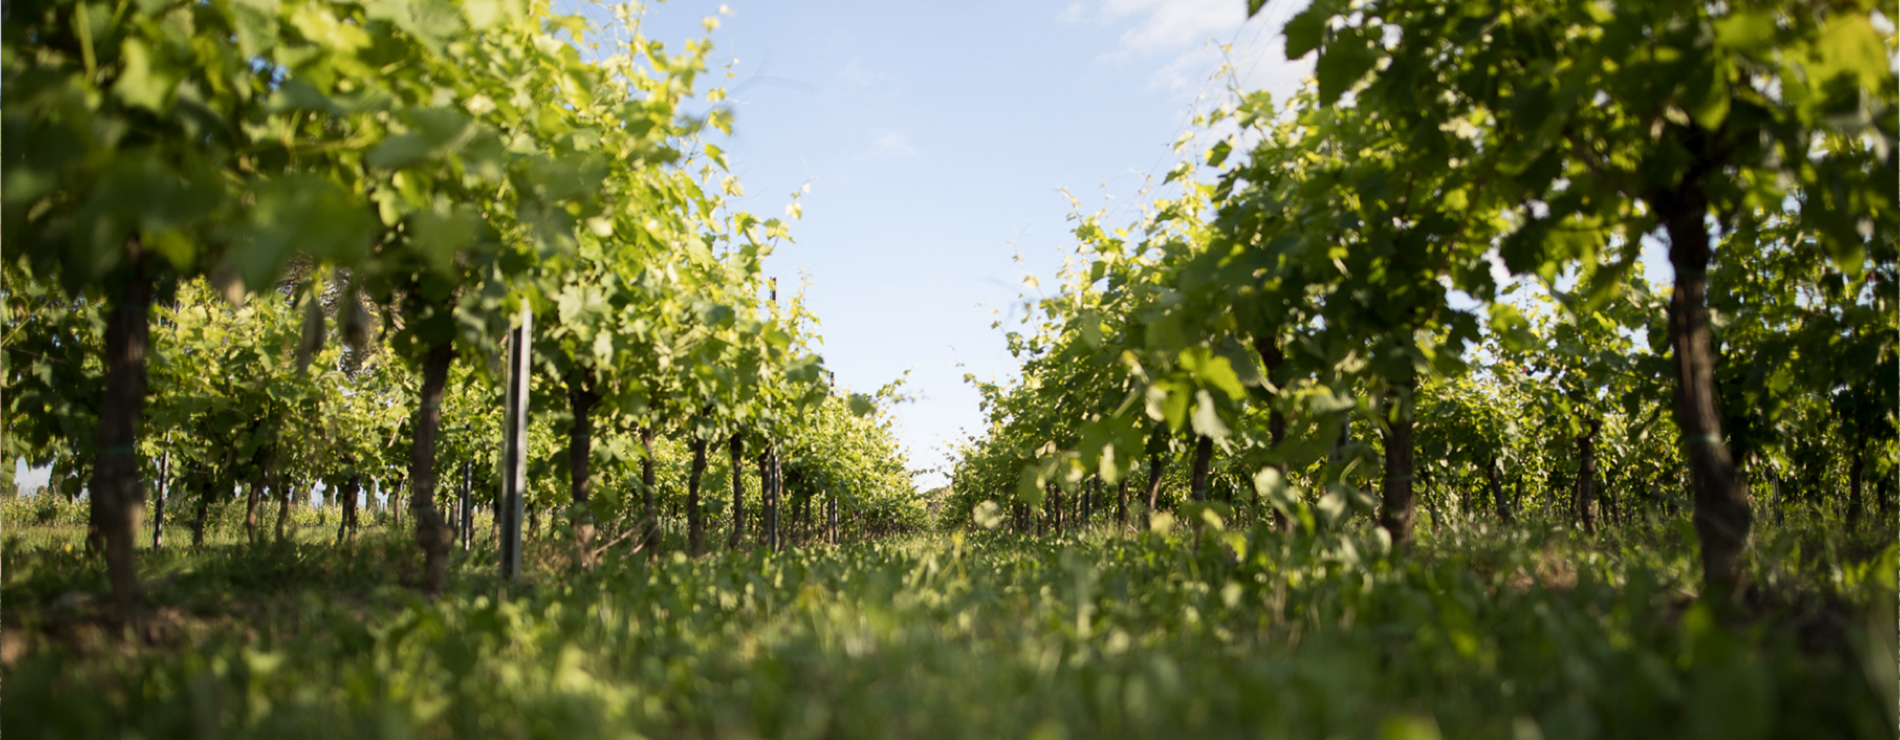 Zonin Vineyards